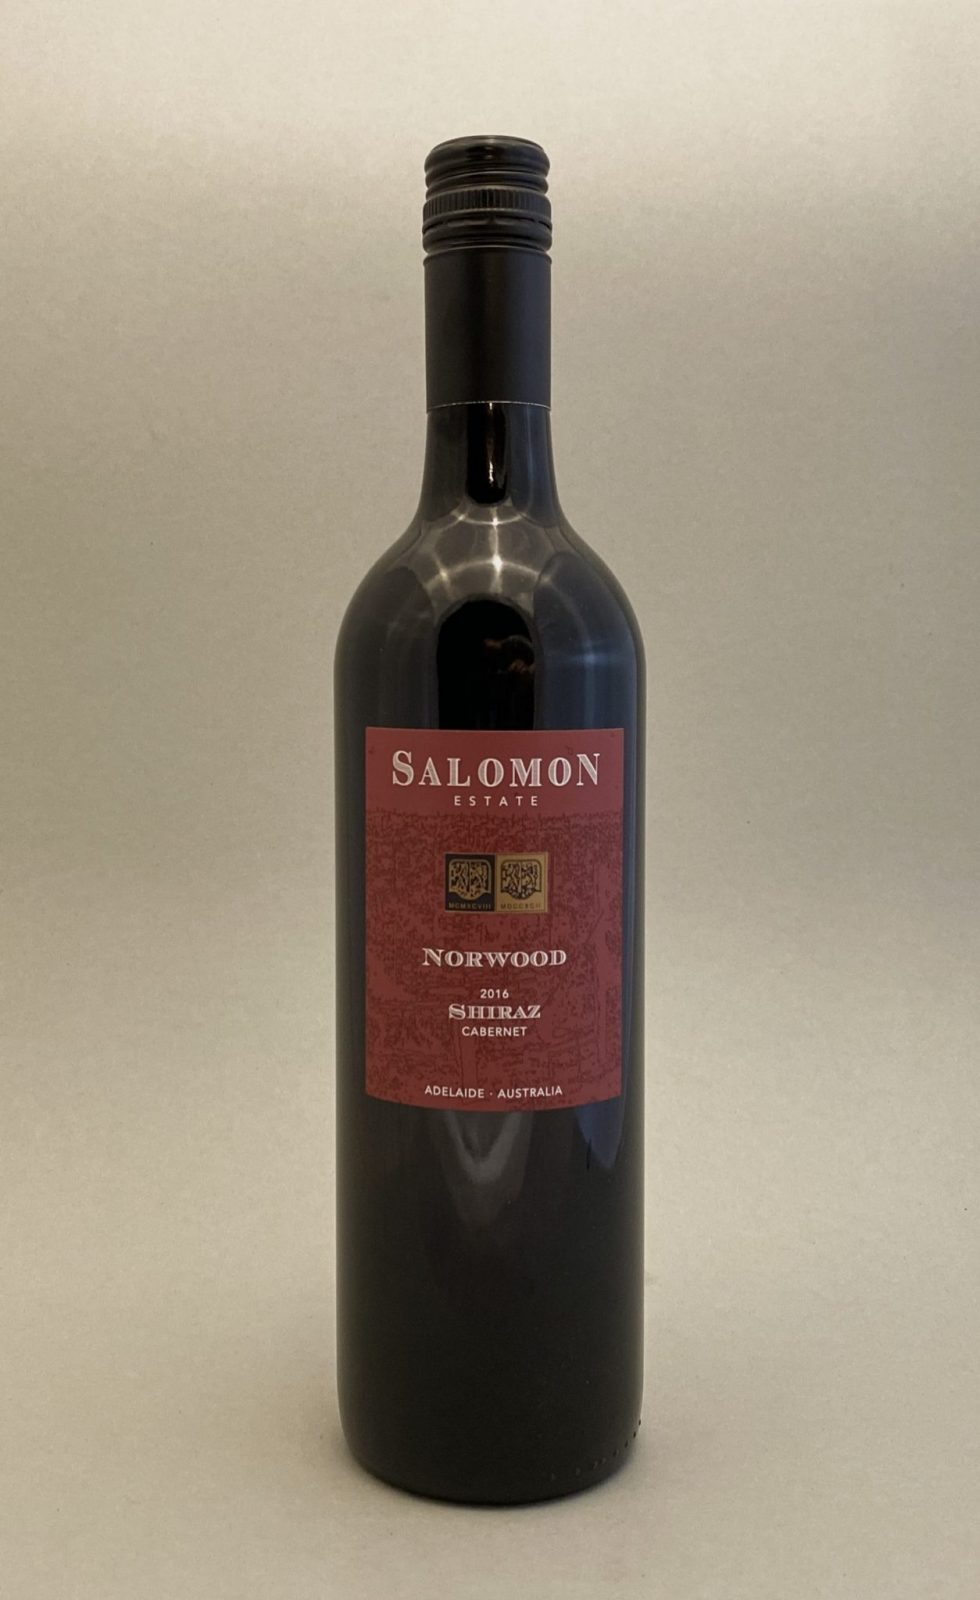 SALOMON Norwood Shiraz 2016, vinoteka Bratislava slnecnice mesto, petrzalka, vino červene z Australie